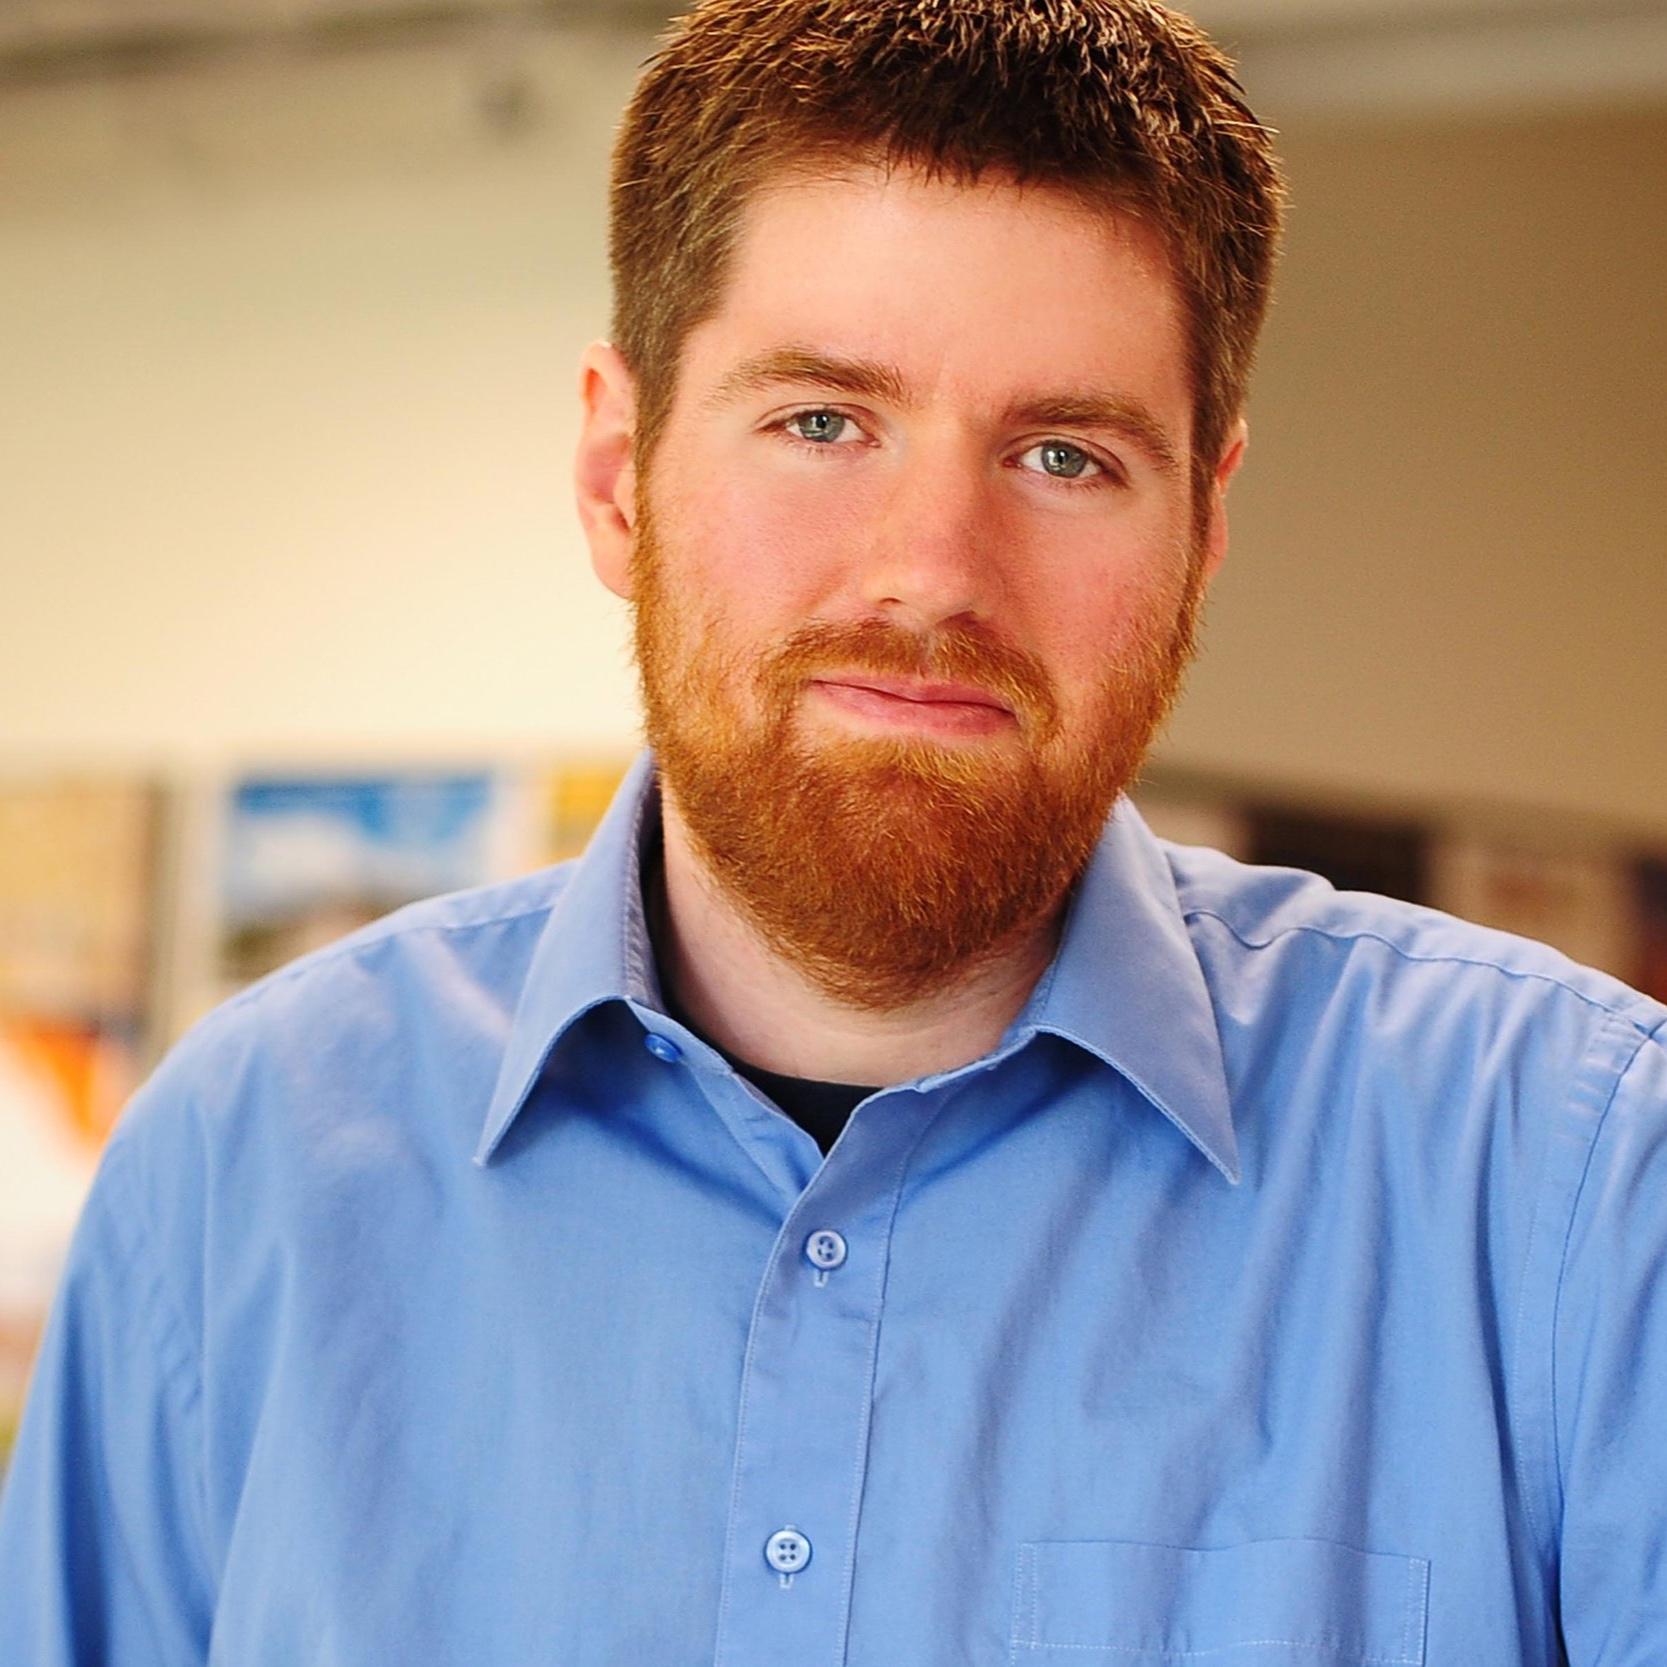 Jason Meyering, AIA, IIDA, LEED AP BD+C - Jason Meyering Architecture